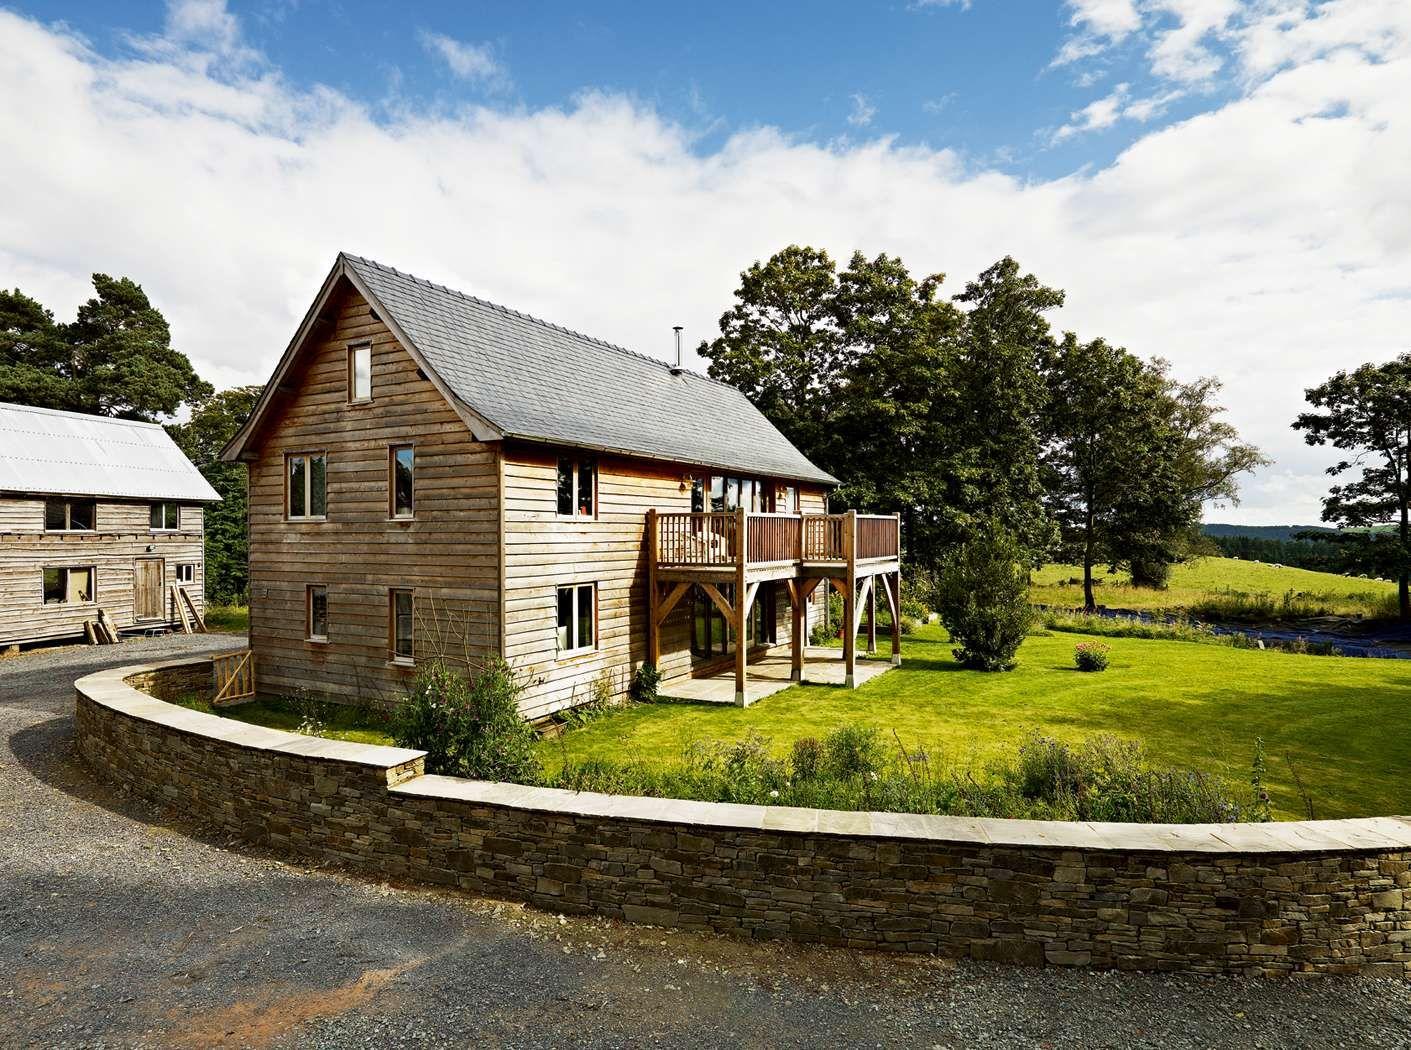 Captivating Amazing Low Cost Self Build | Homebuilding U0026 Renovating